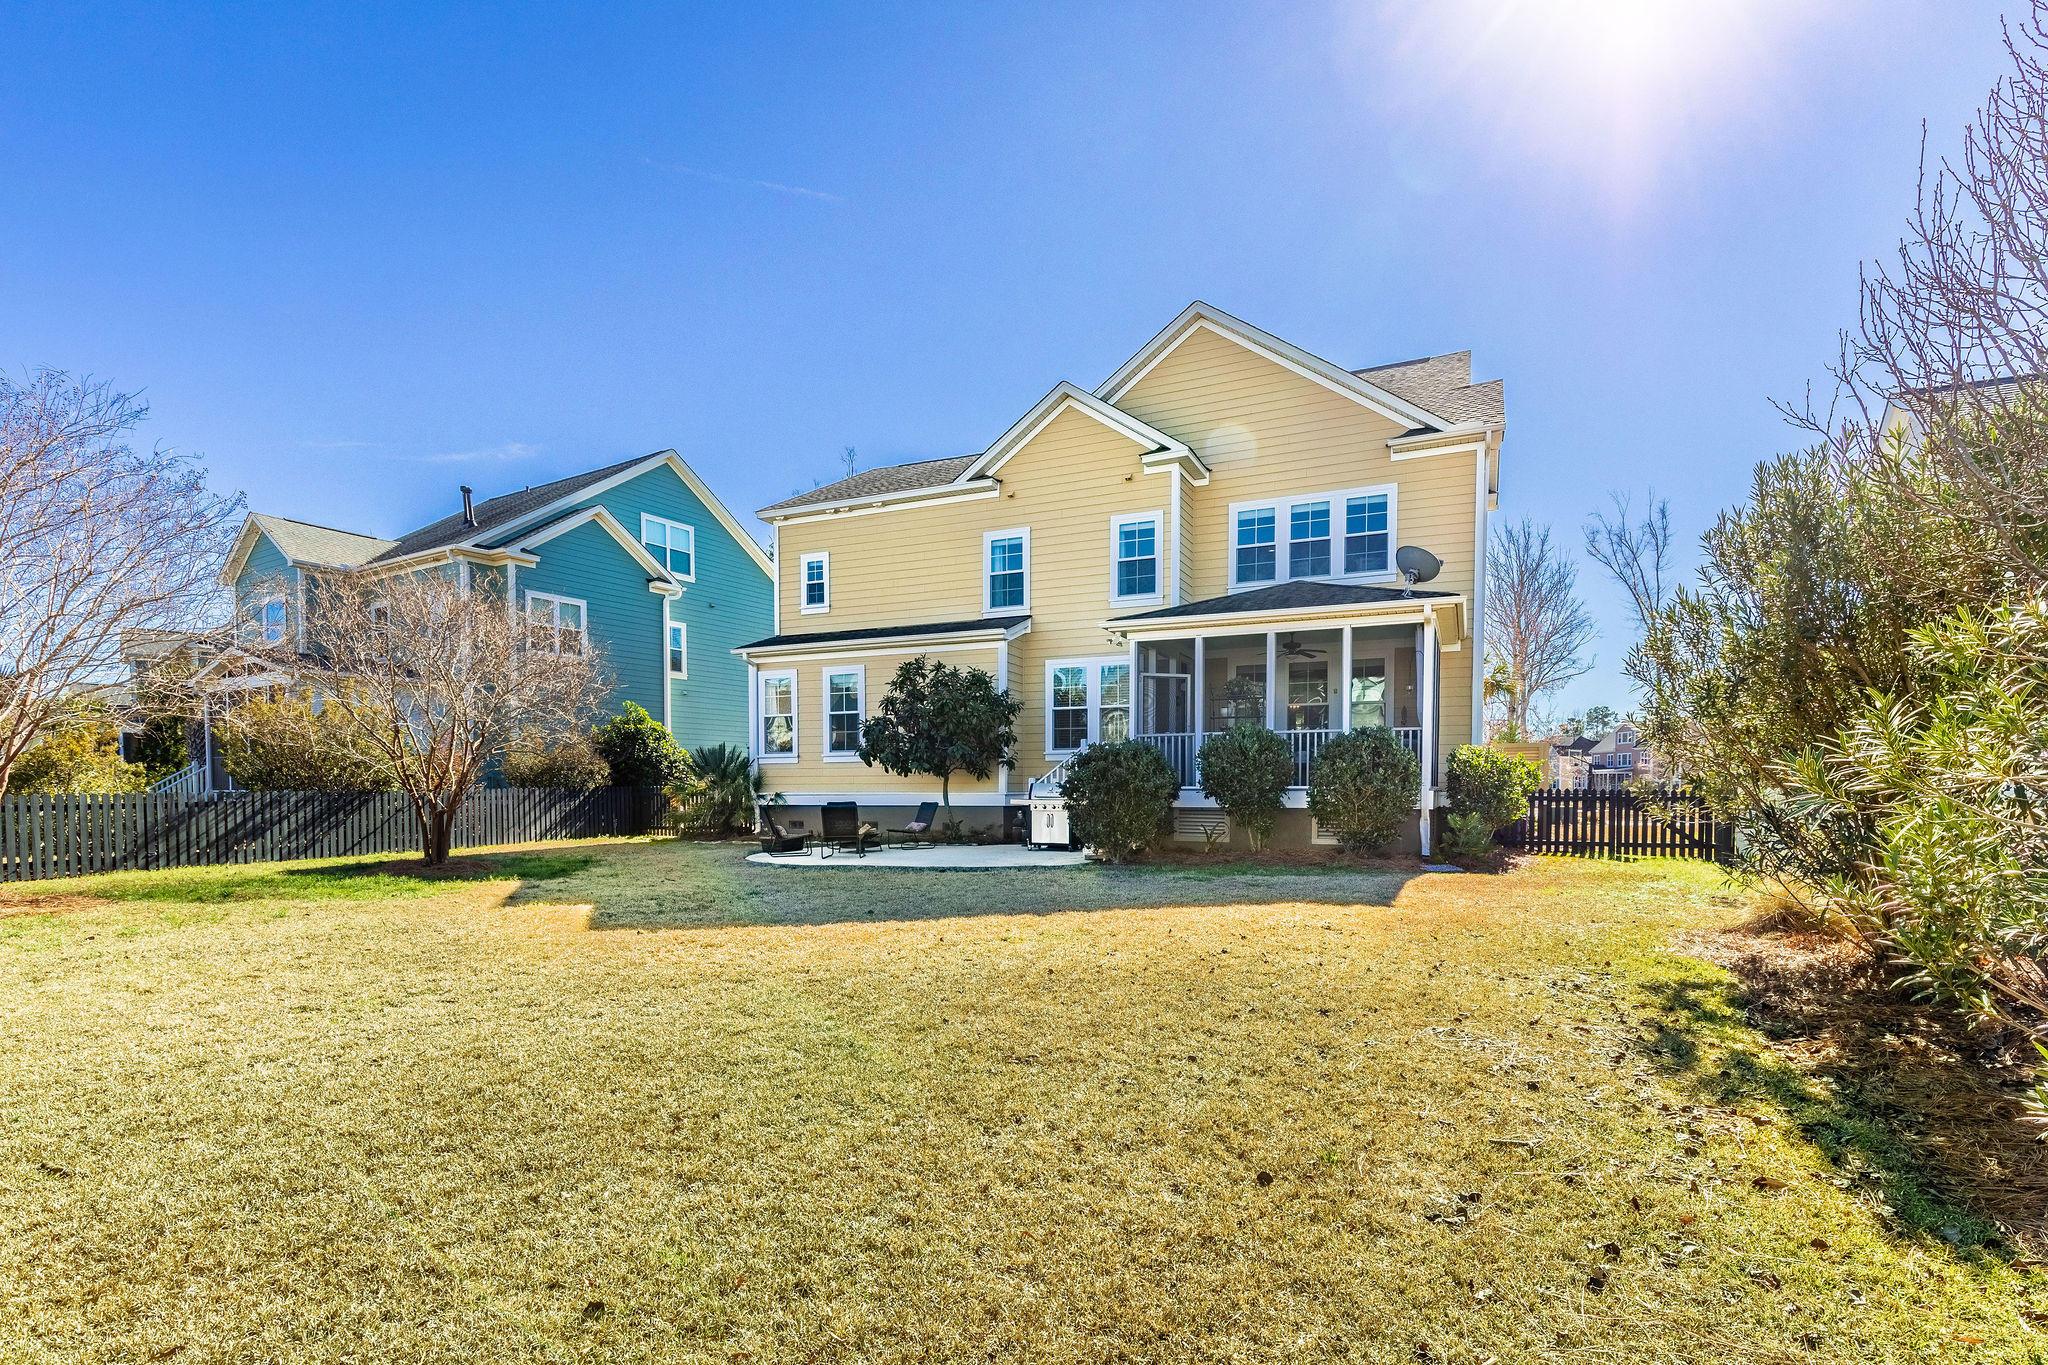 Dunes West Homes For Sale - 3212 Hatchway, Mount Pleasant, SC - 40